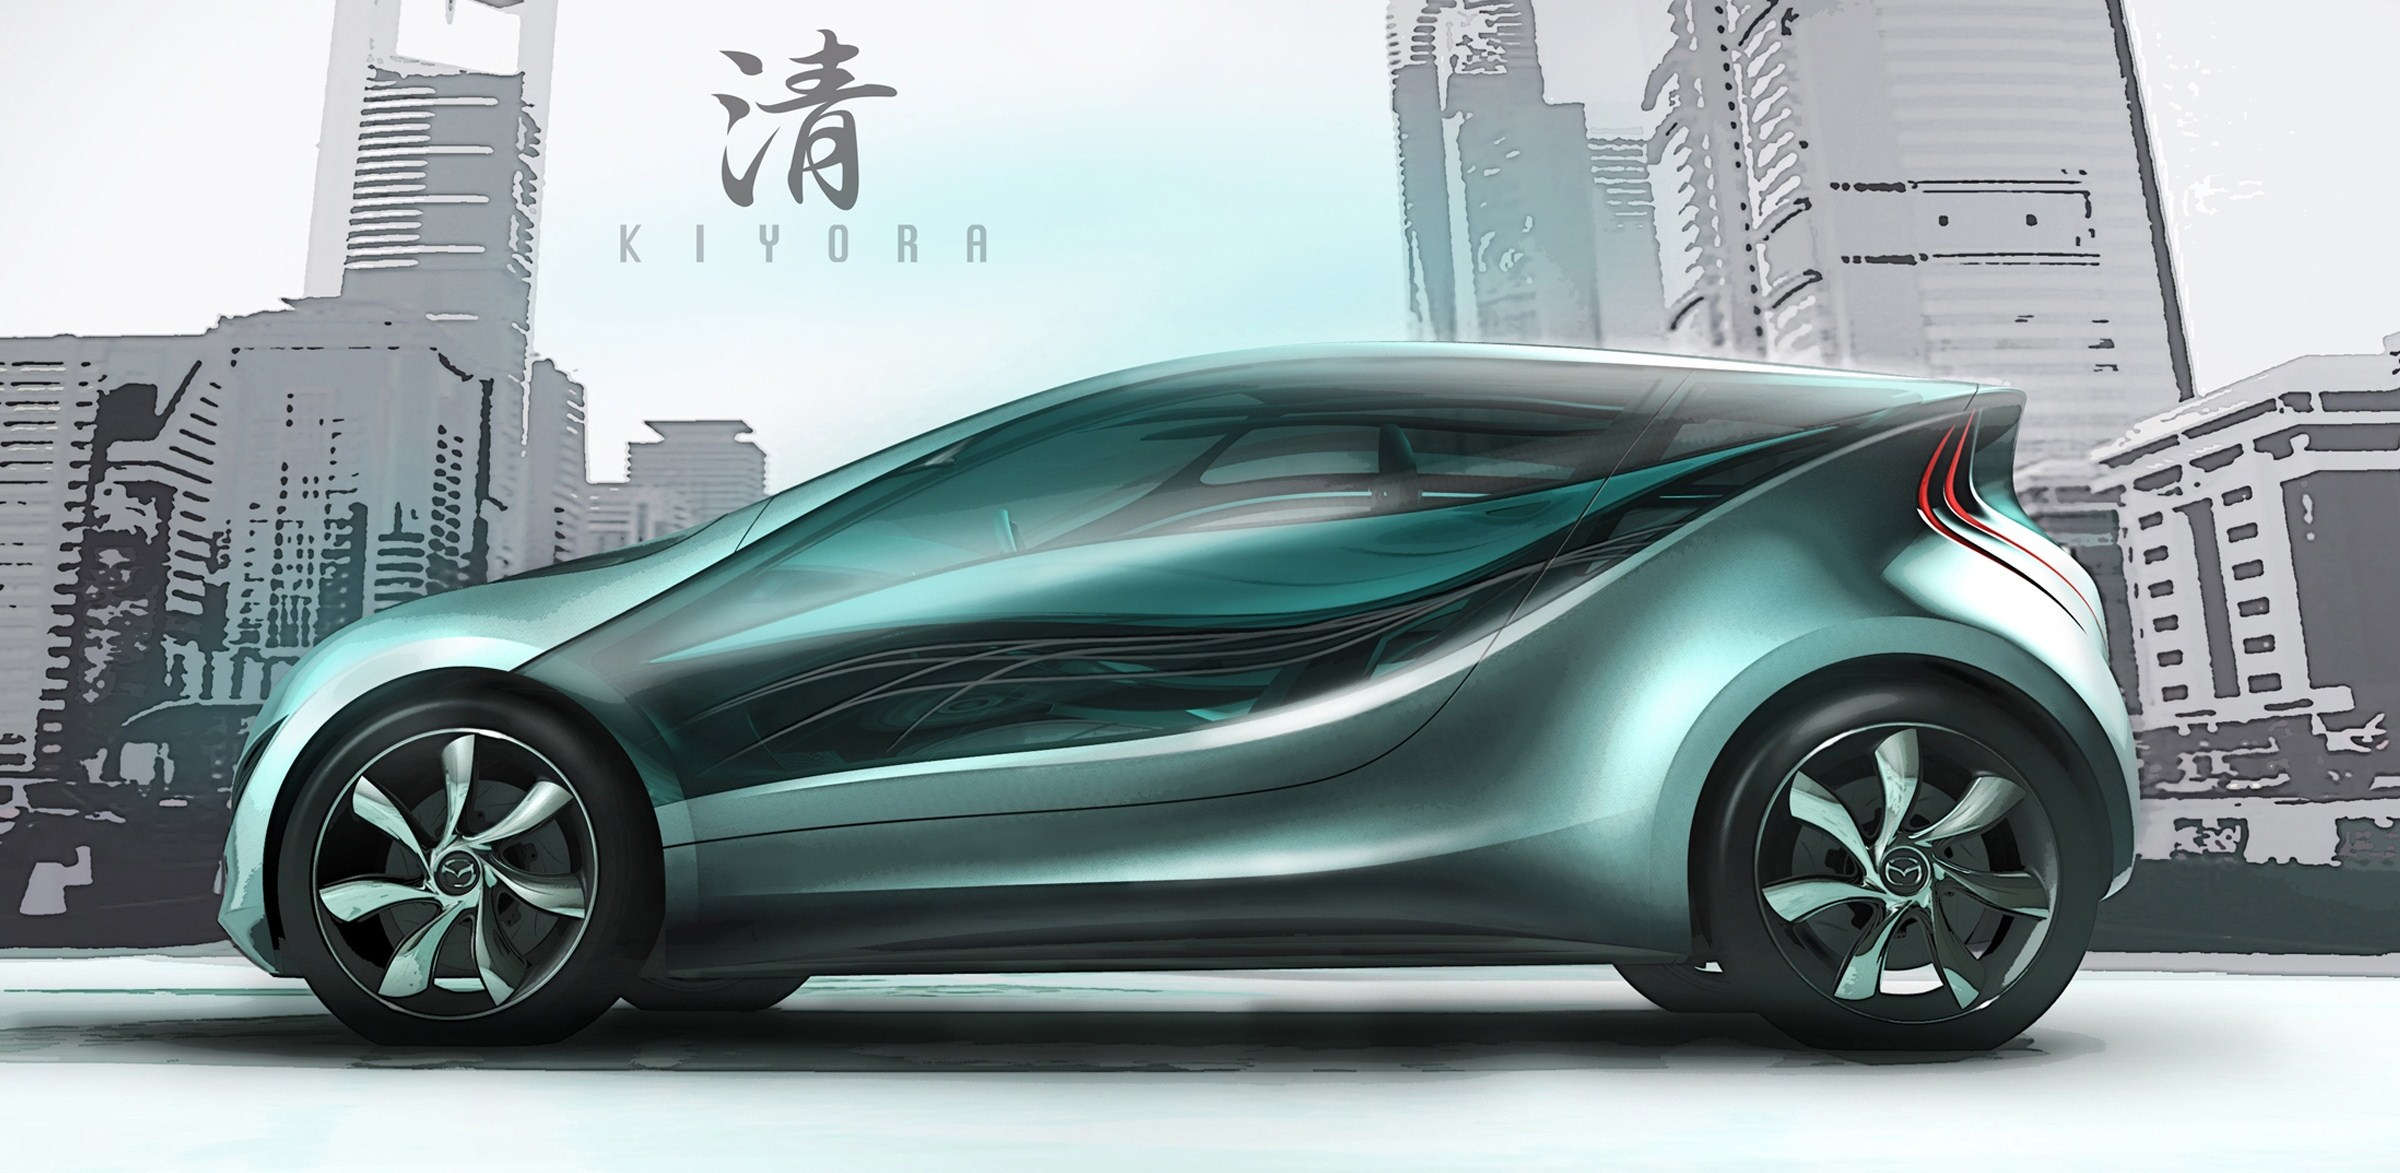 https://www.automobilesreview.com/gallery/mazda-kiyora-concept/mazda-kiyora-concept-02.jpg